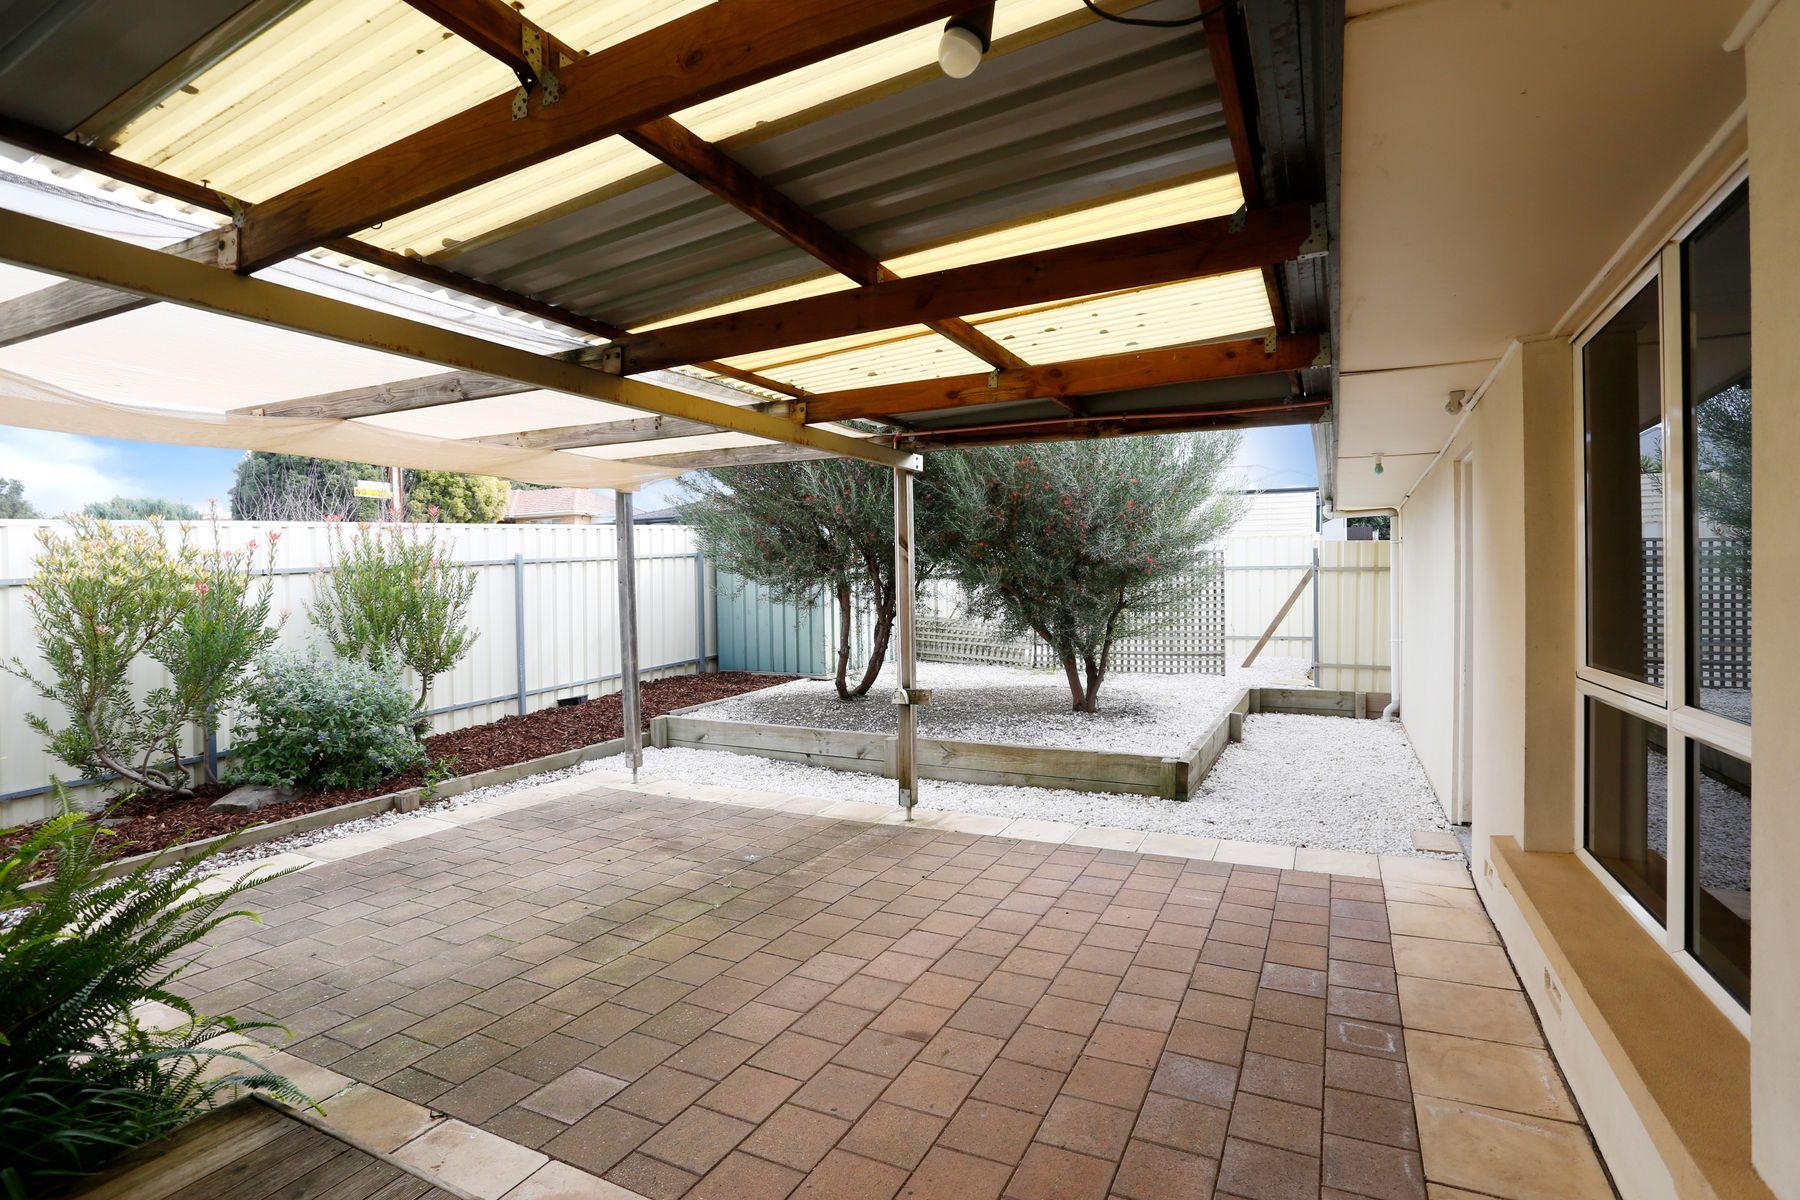 13 Araluen Street, Ridgehaven, SA 5097